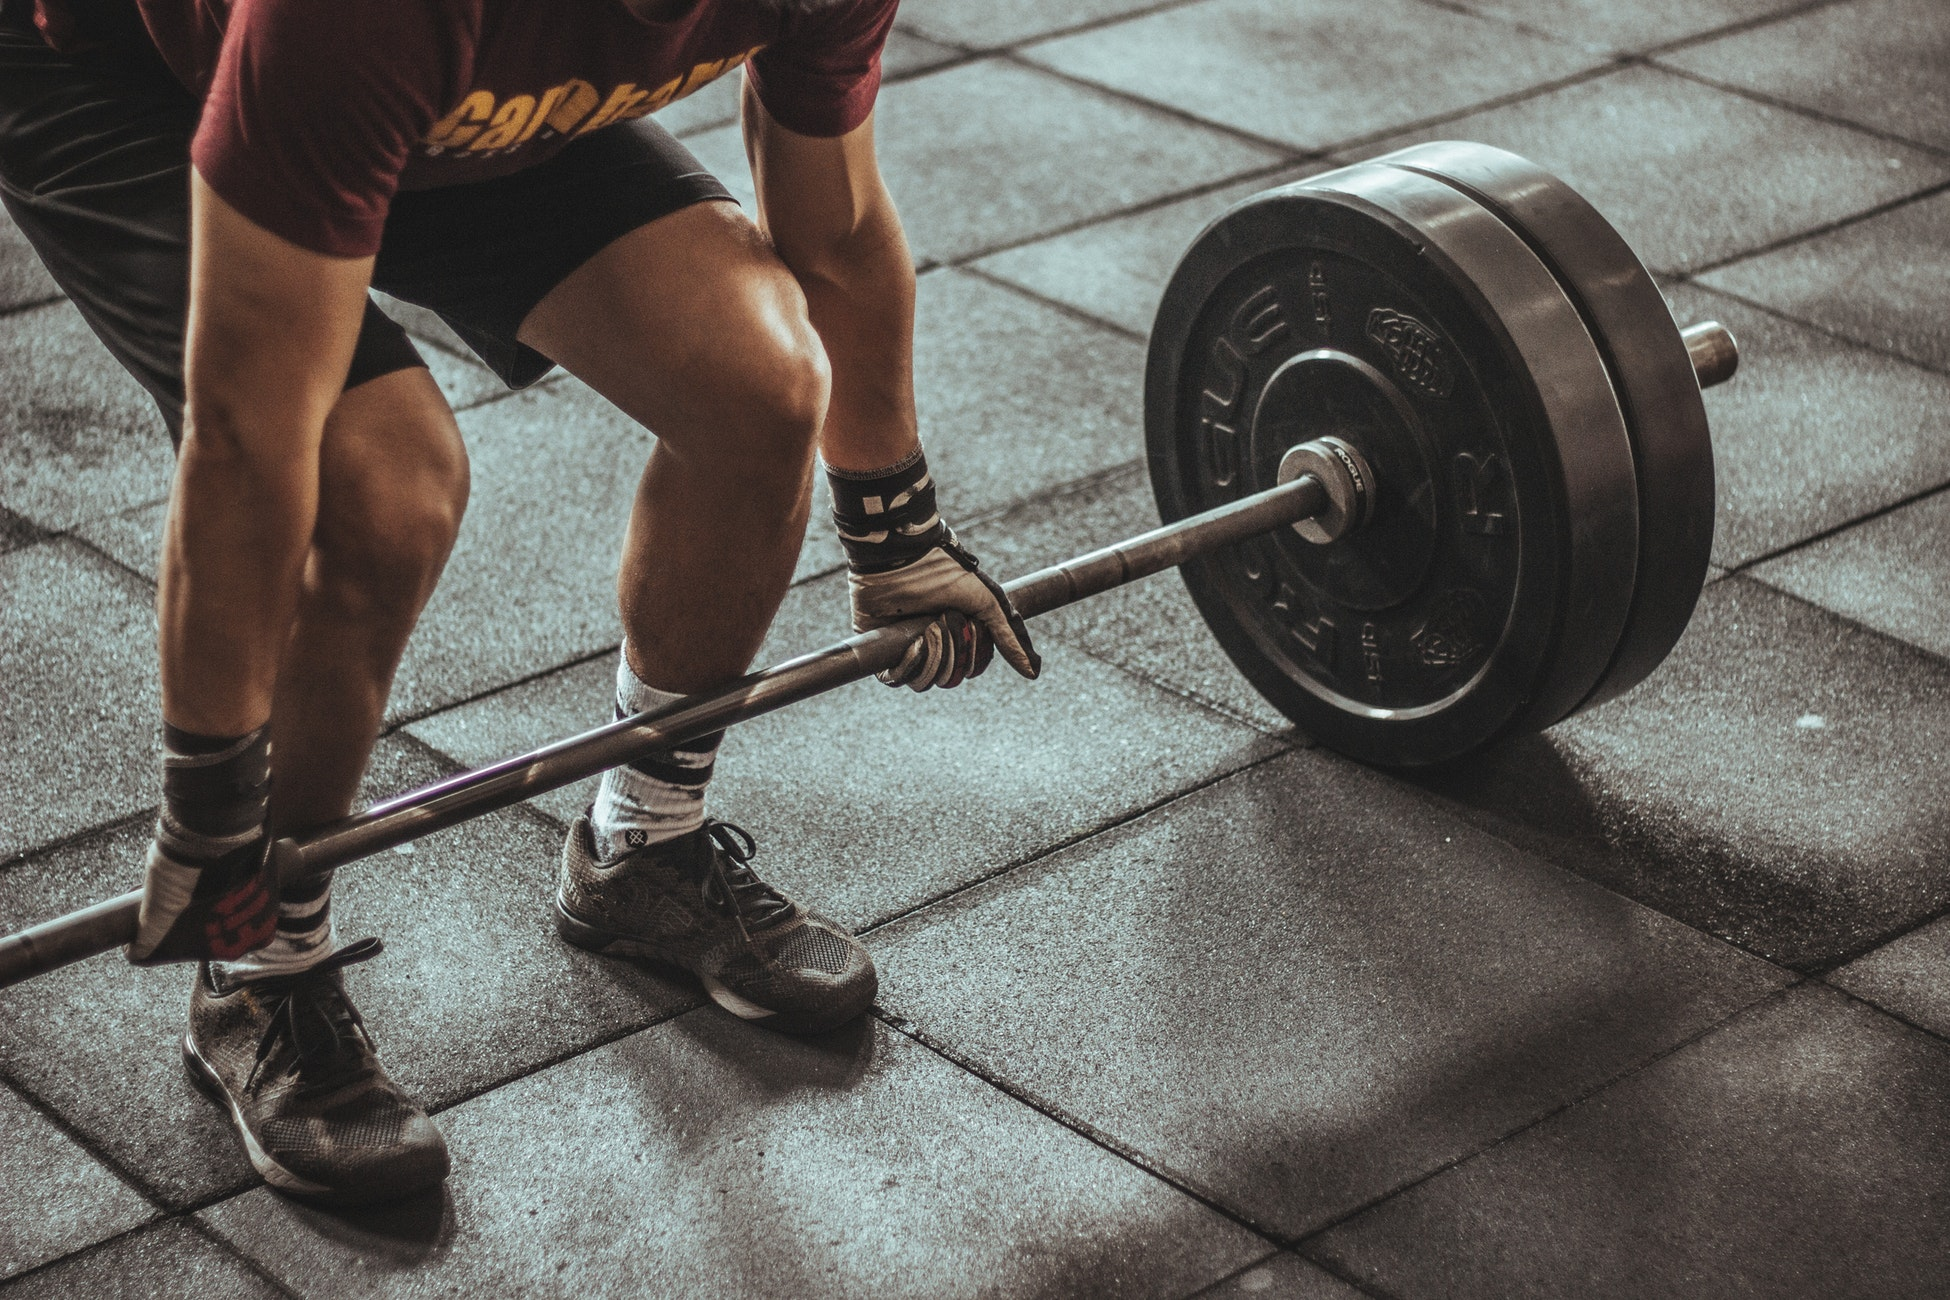 Earnests Top 5 Activewear Earnest Reads Singlet Fitness Gymshark Adidas